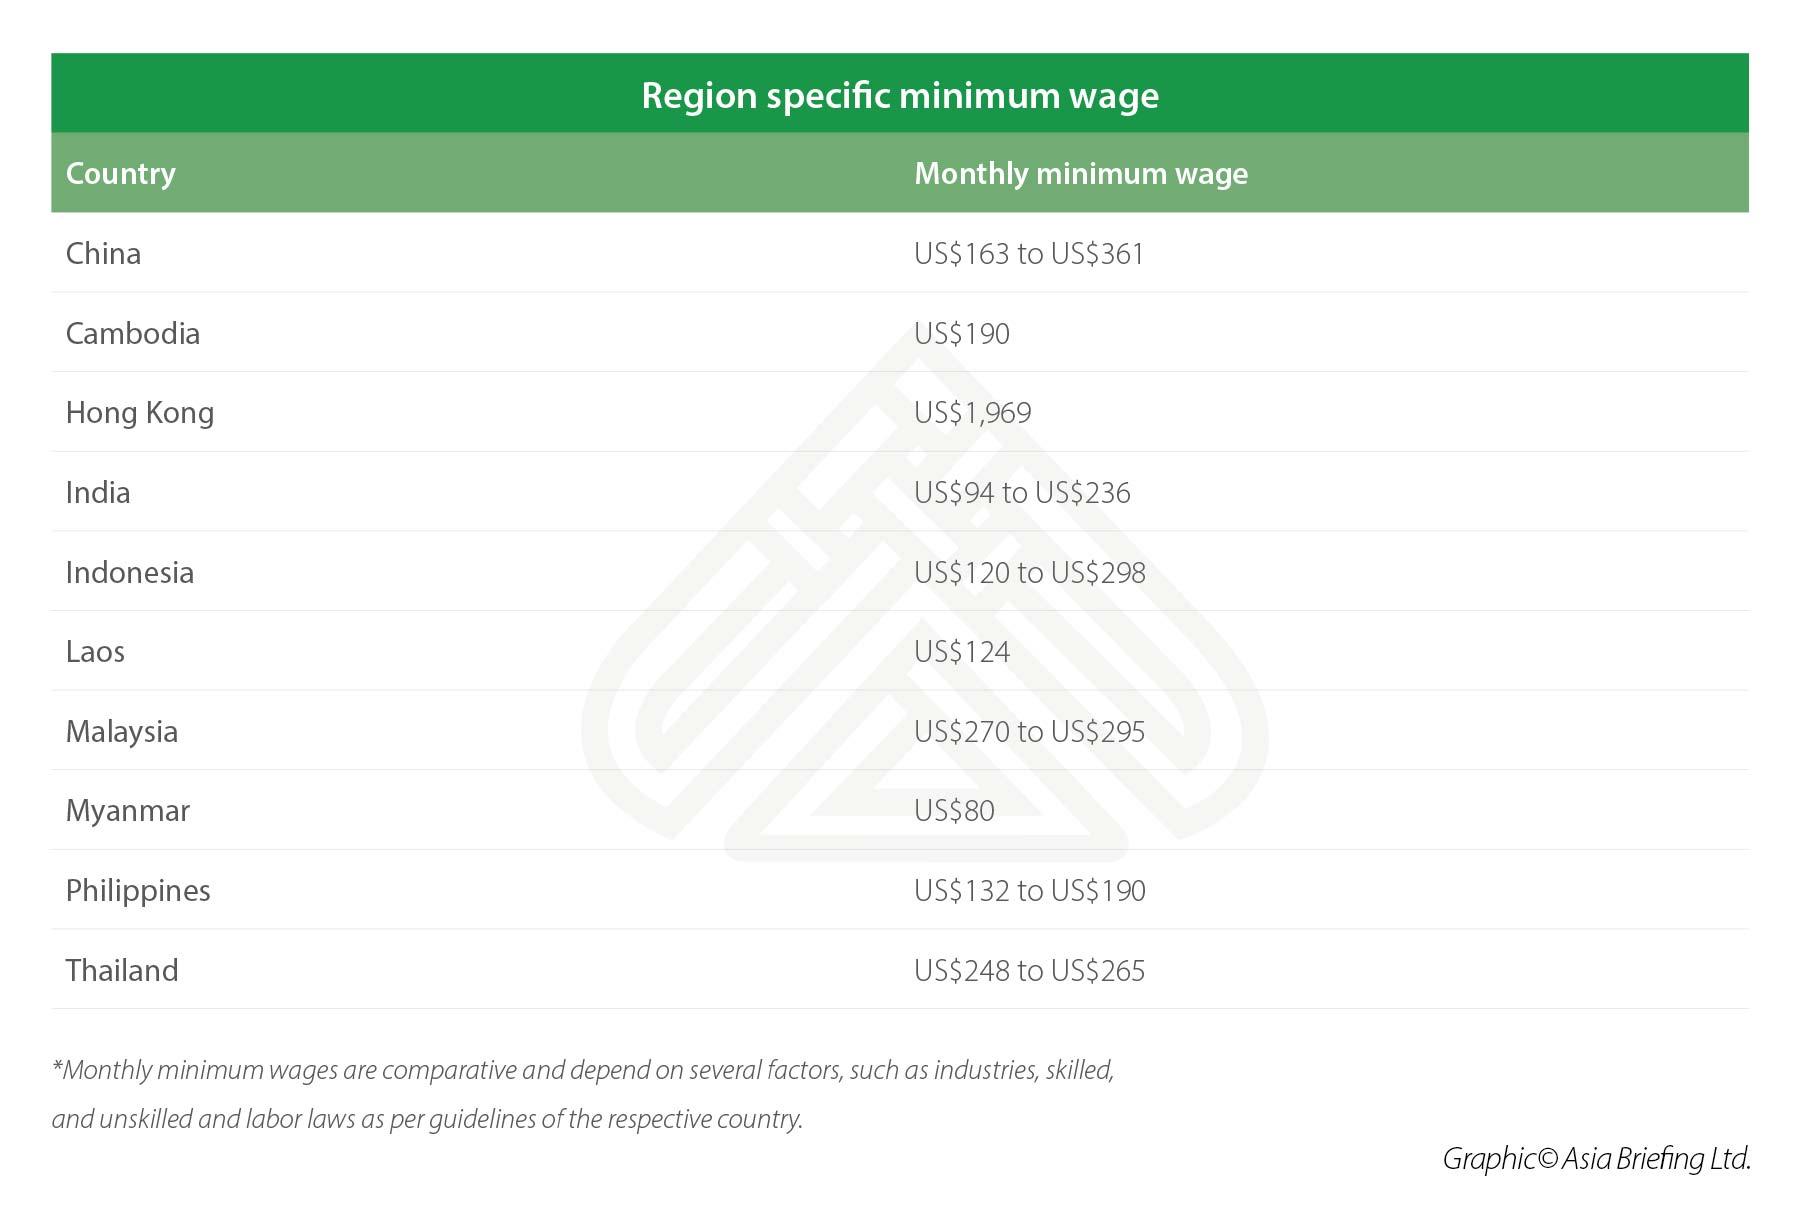 Regional minimum wages